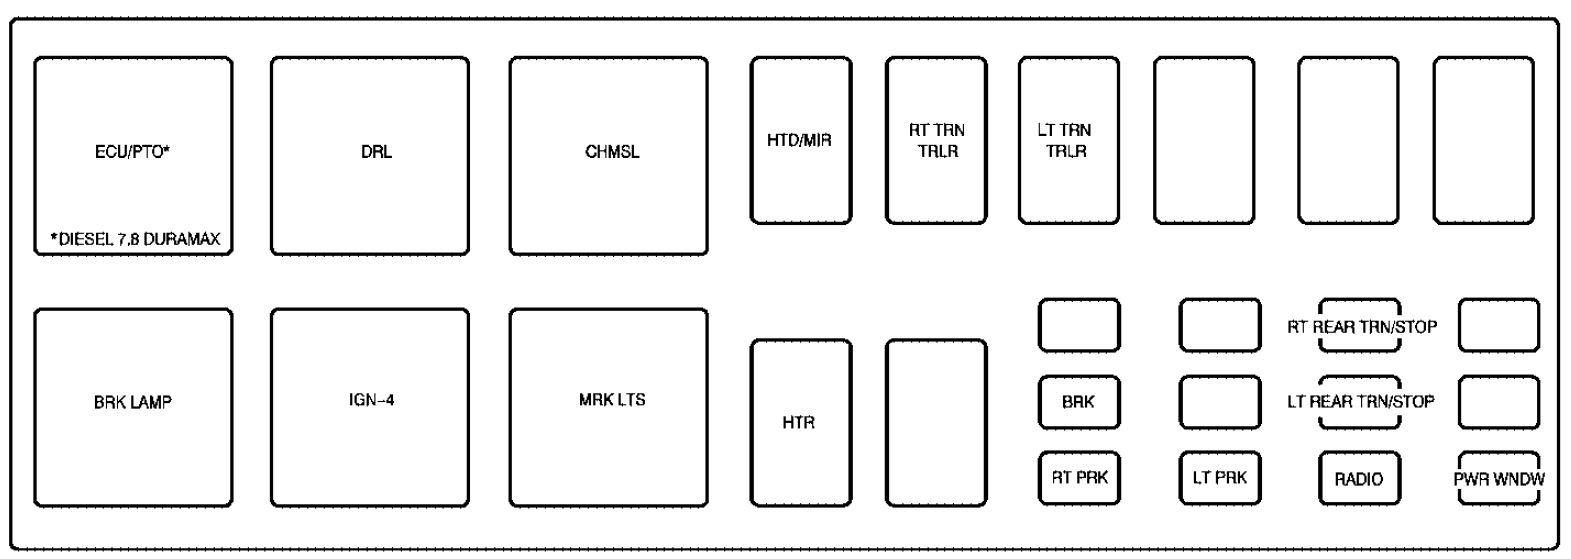 2008 Chevy Fuse Box Diagram